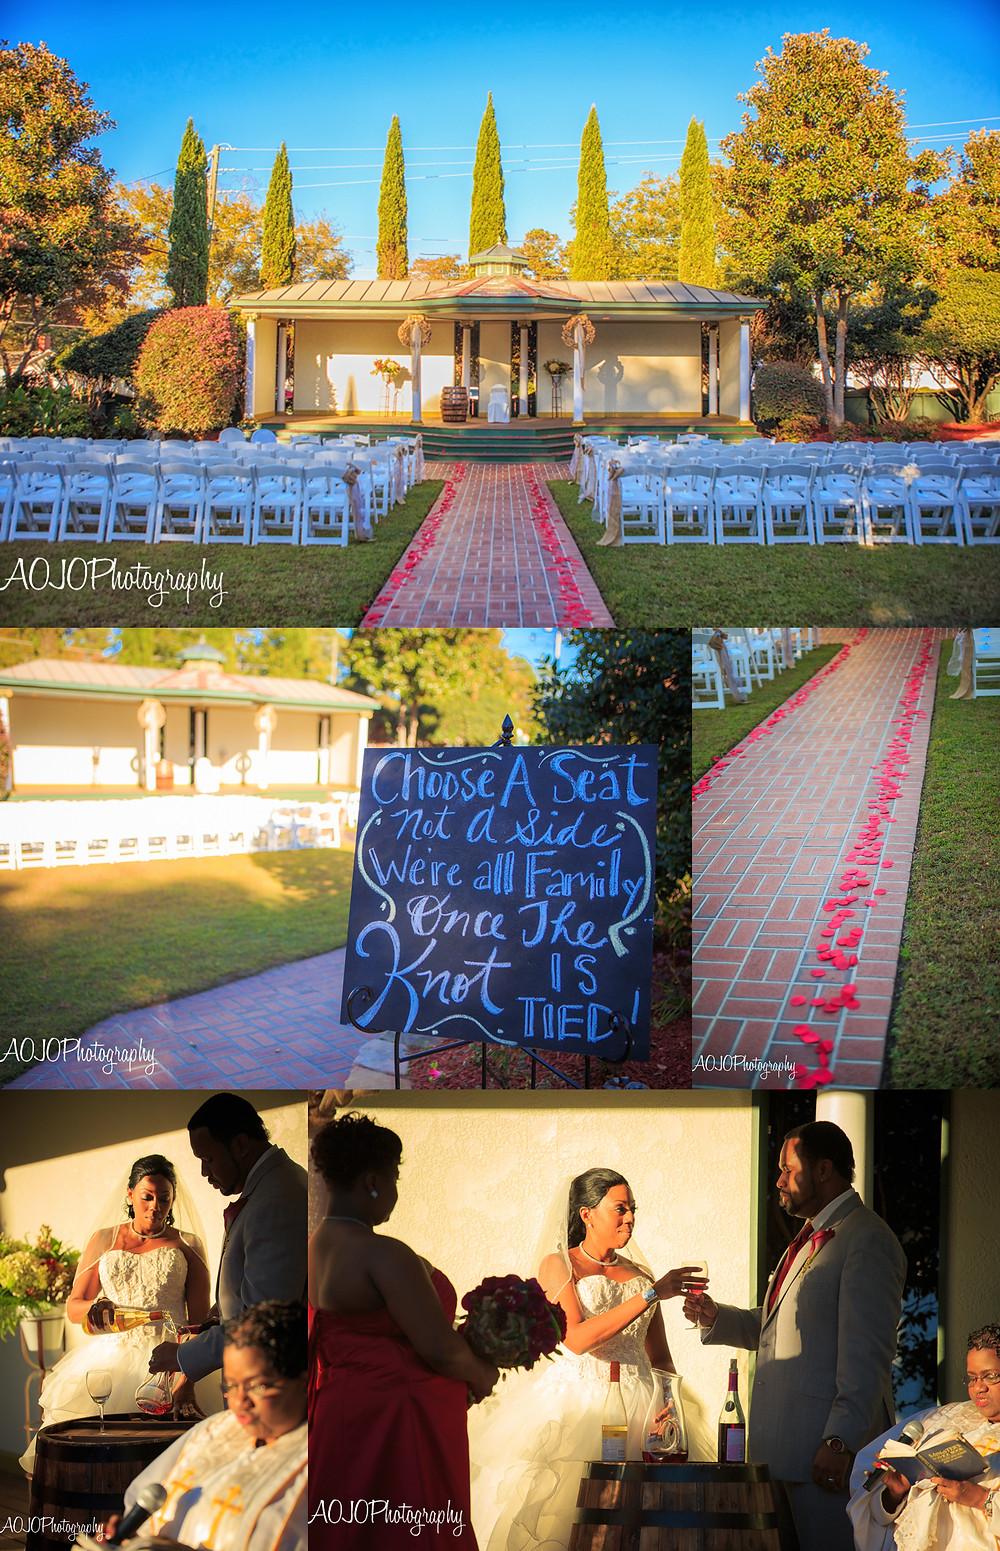 AOJOPhotography-Raleigh-Wedding-Photographer6.jpg